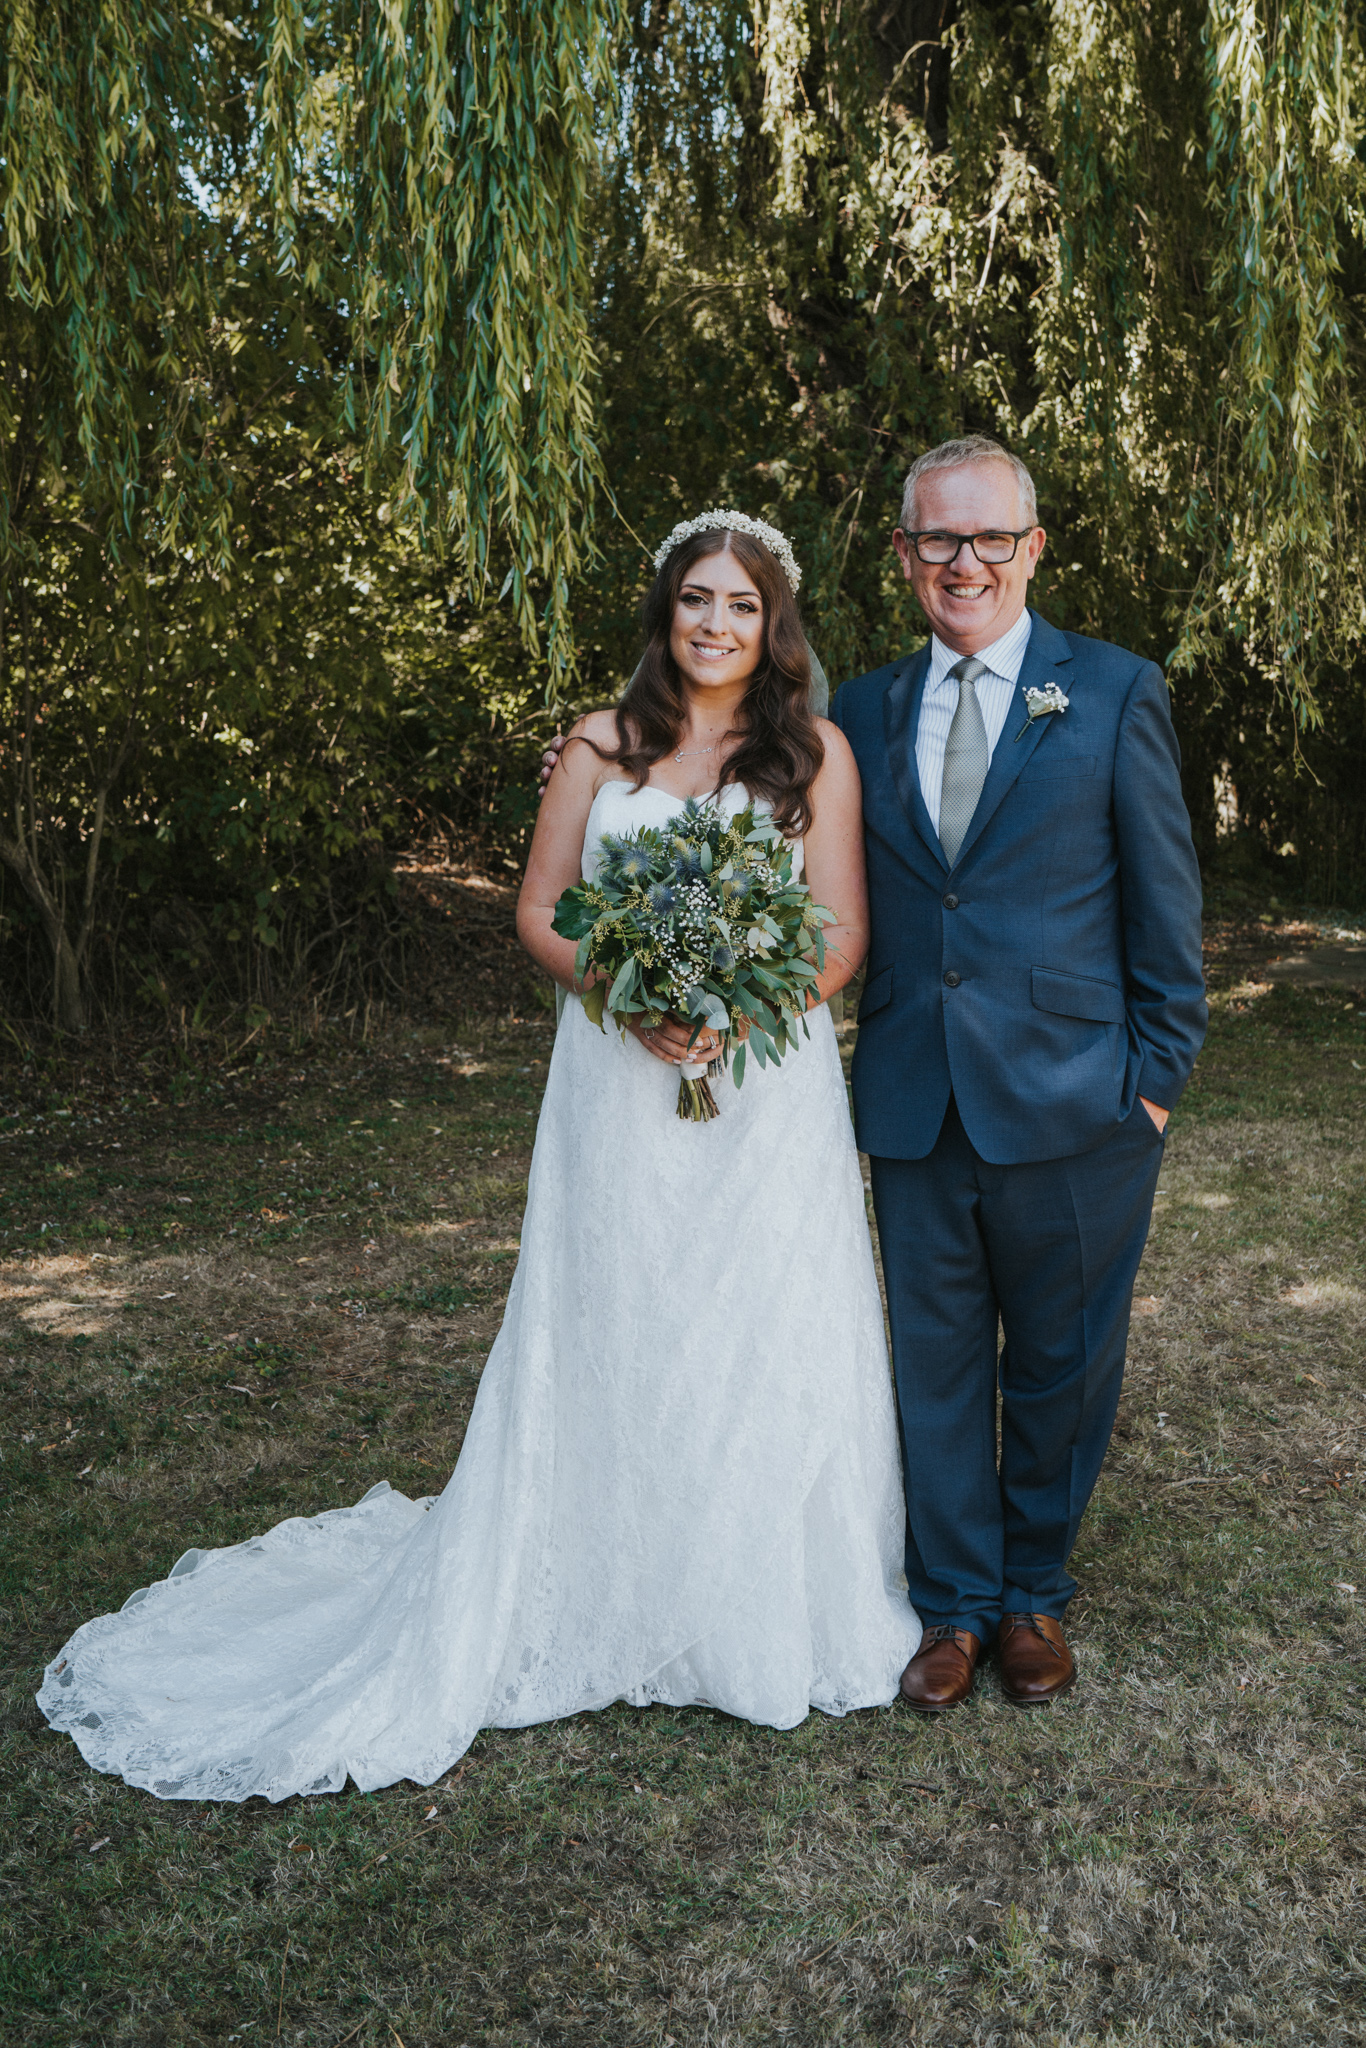 Sophie-Christian-Prested-Hall-Grace-Elizabeth-Previews-Essex-Norfolk-Suffolk-Devon-Alternative-Wedding-Photographer (17 of 20).jpg